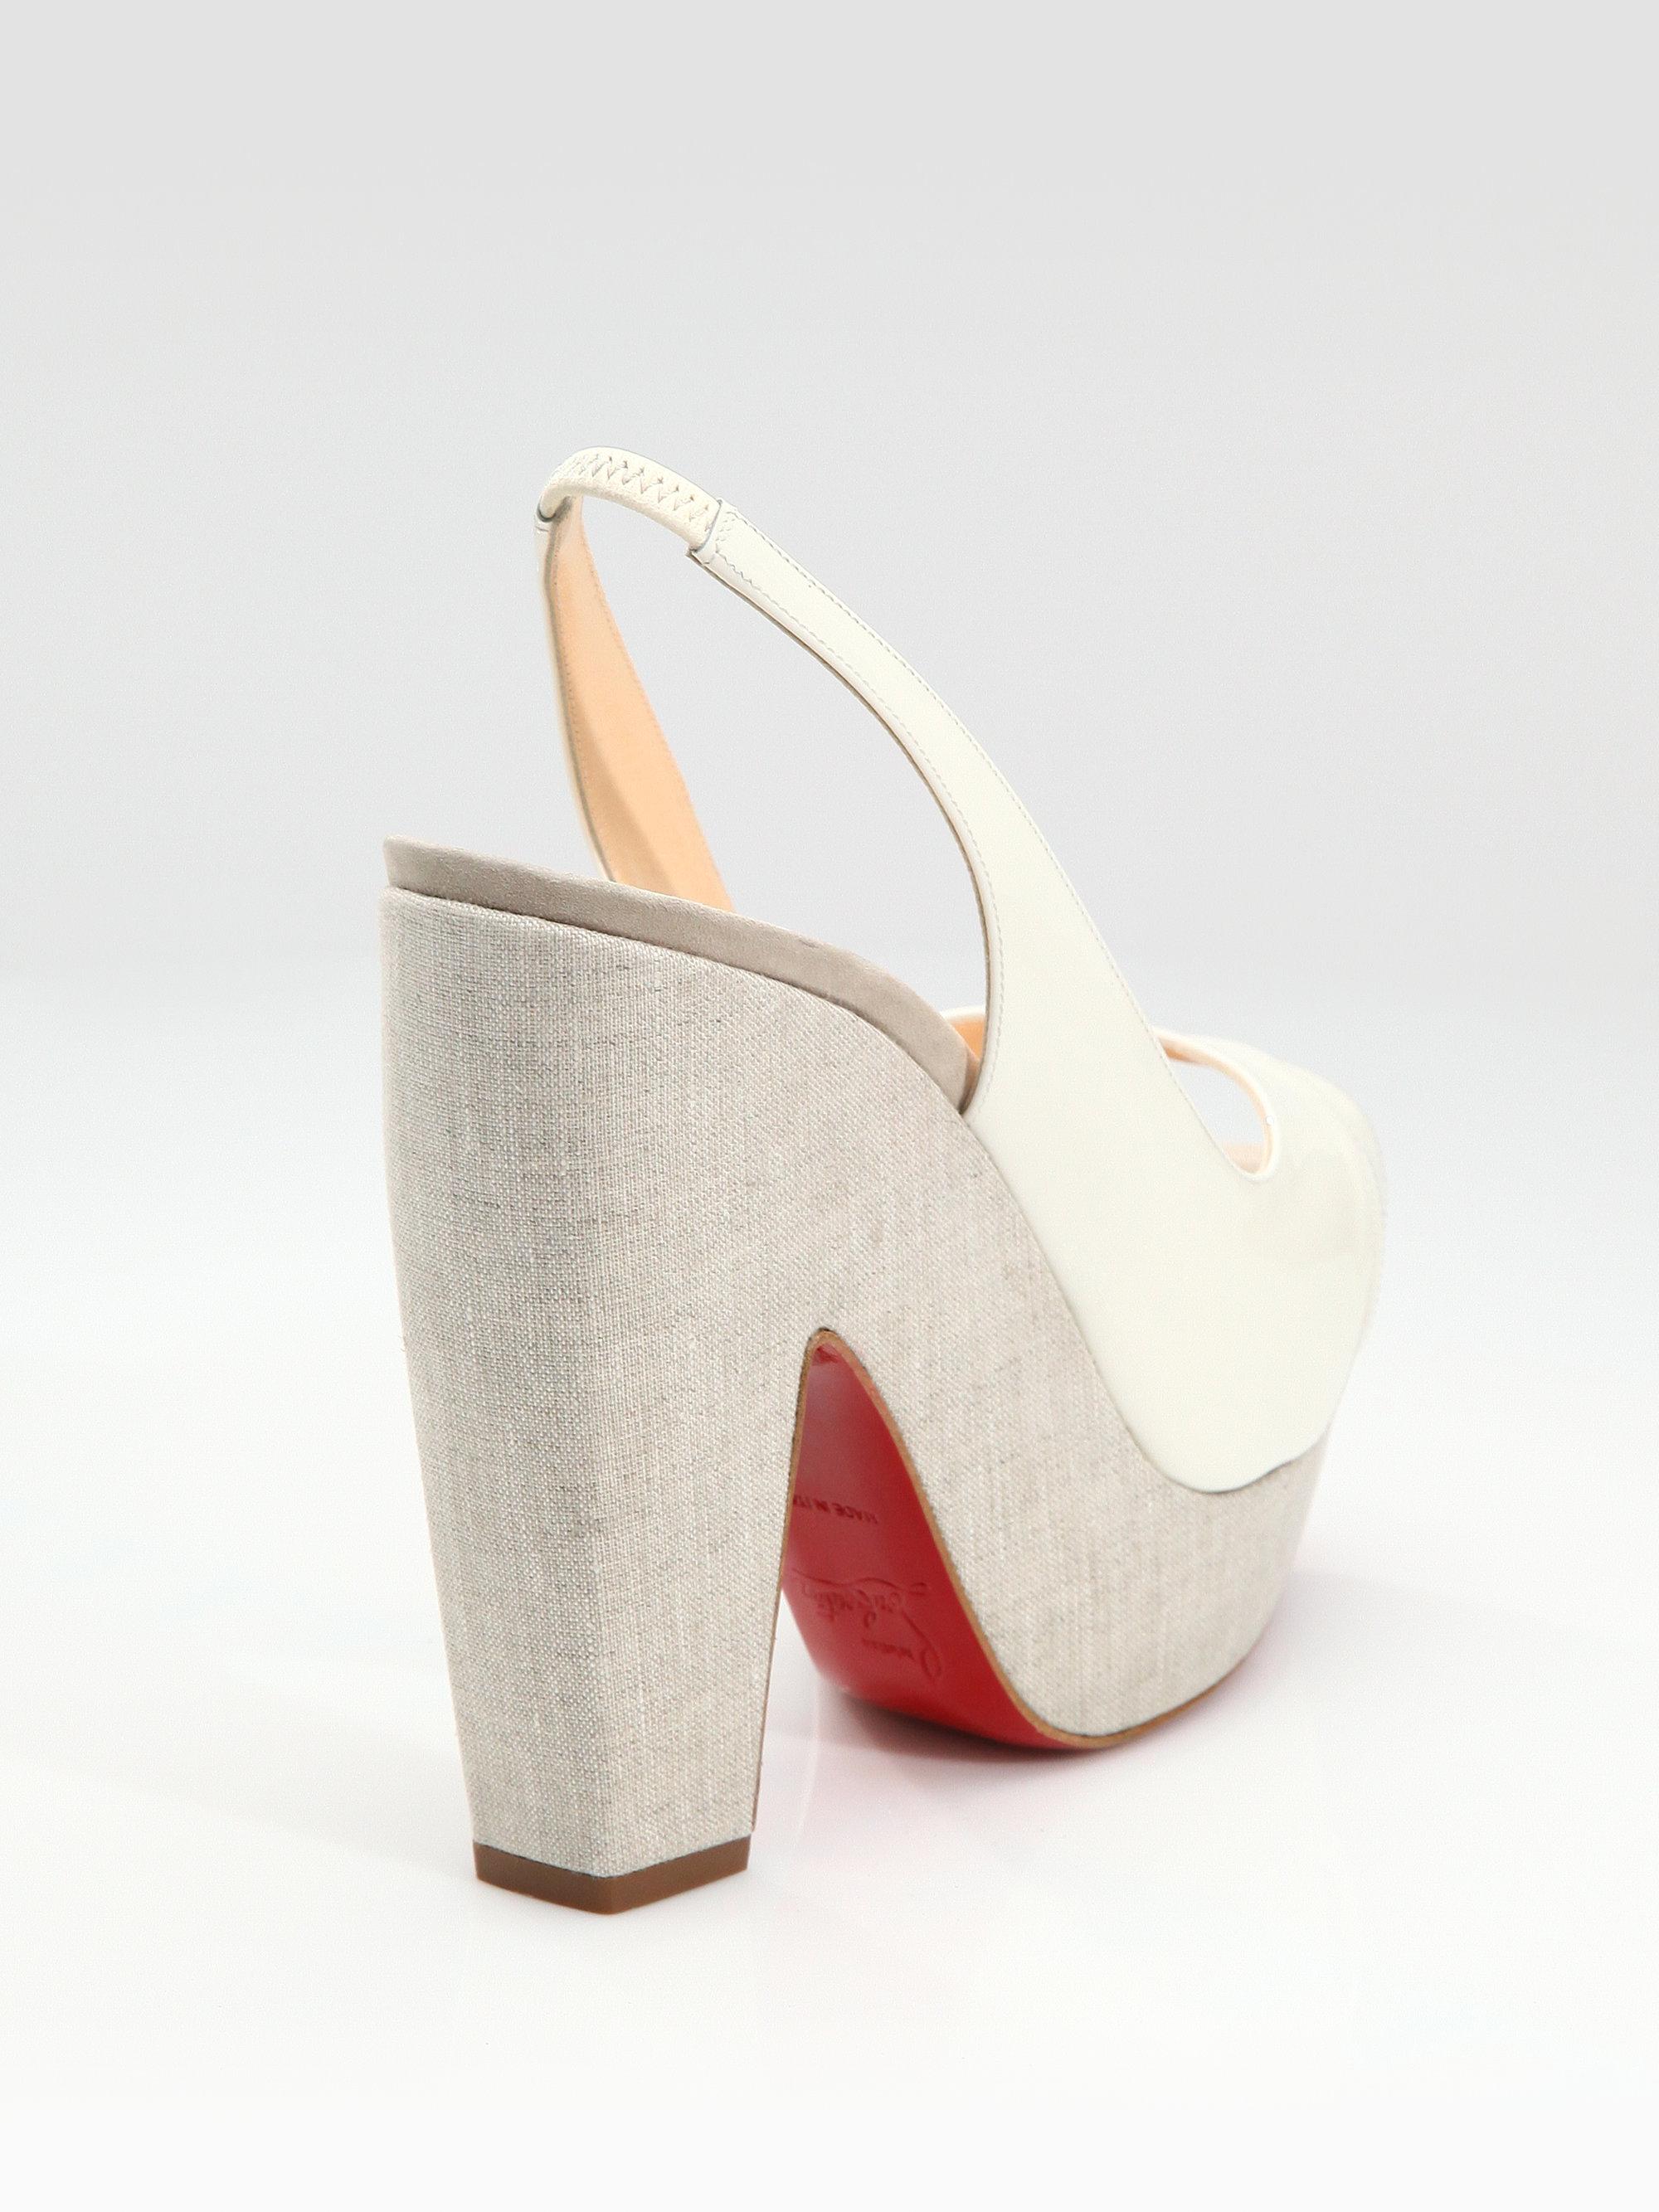 Artesur ? christian louboutin platform slingback sandals